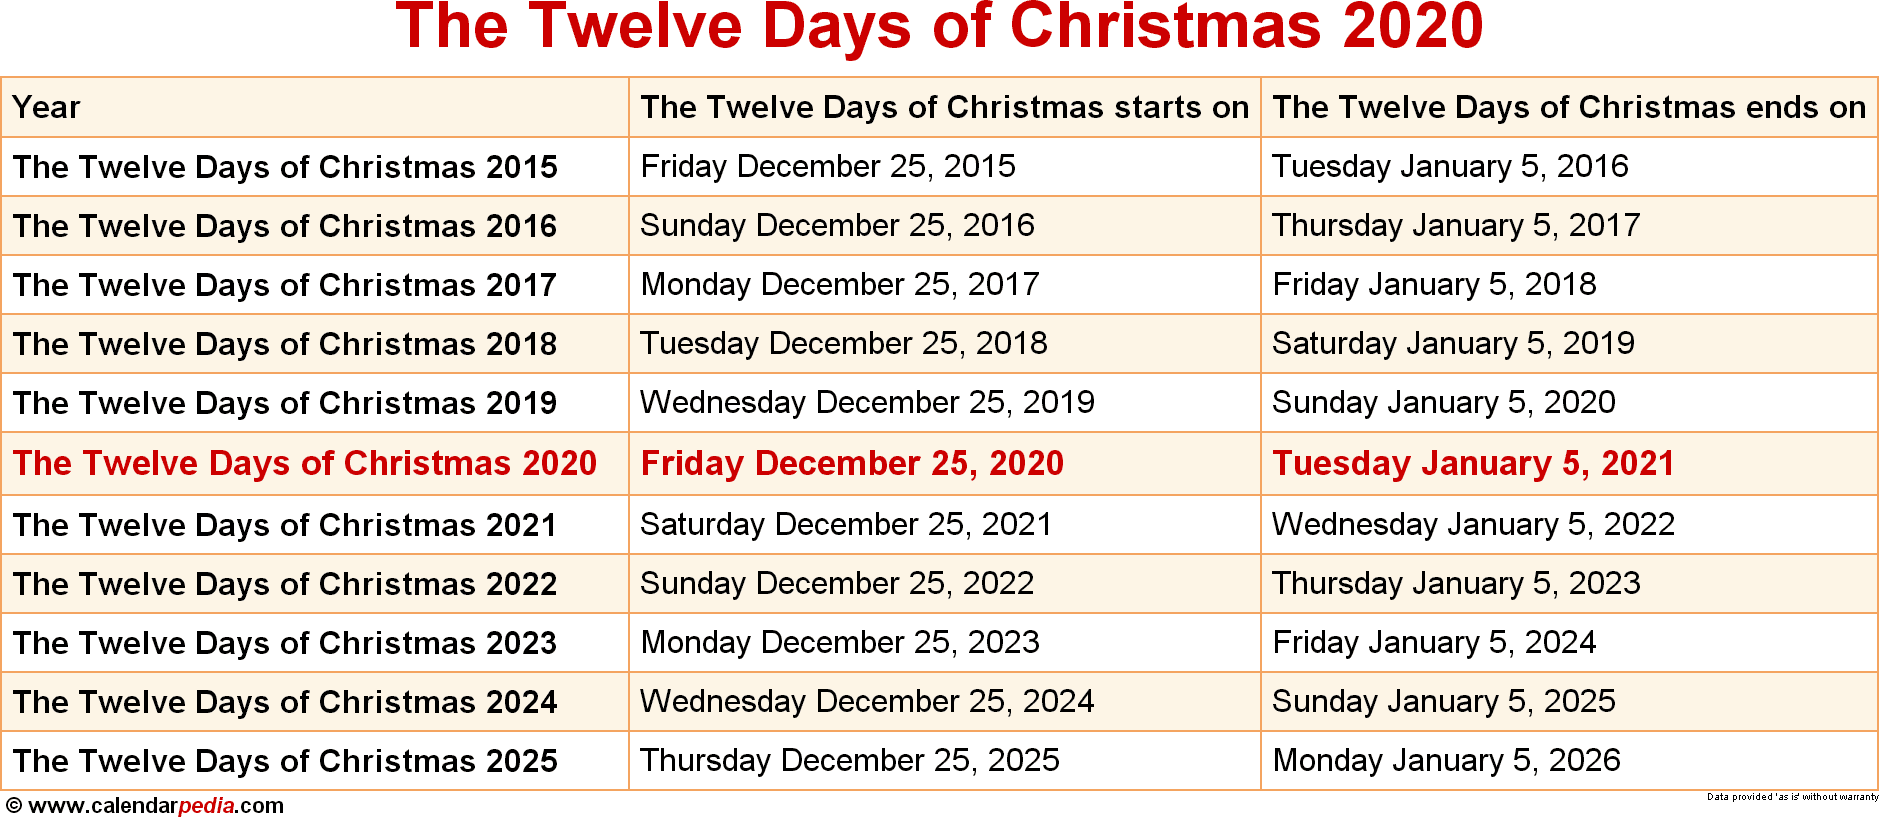 The Twelve Days of Christmas 2020